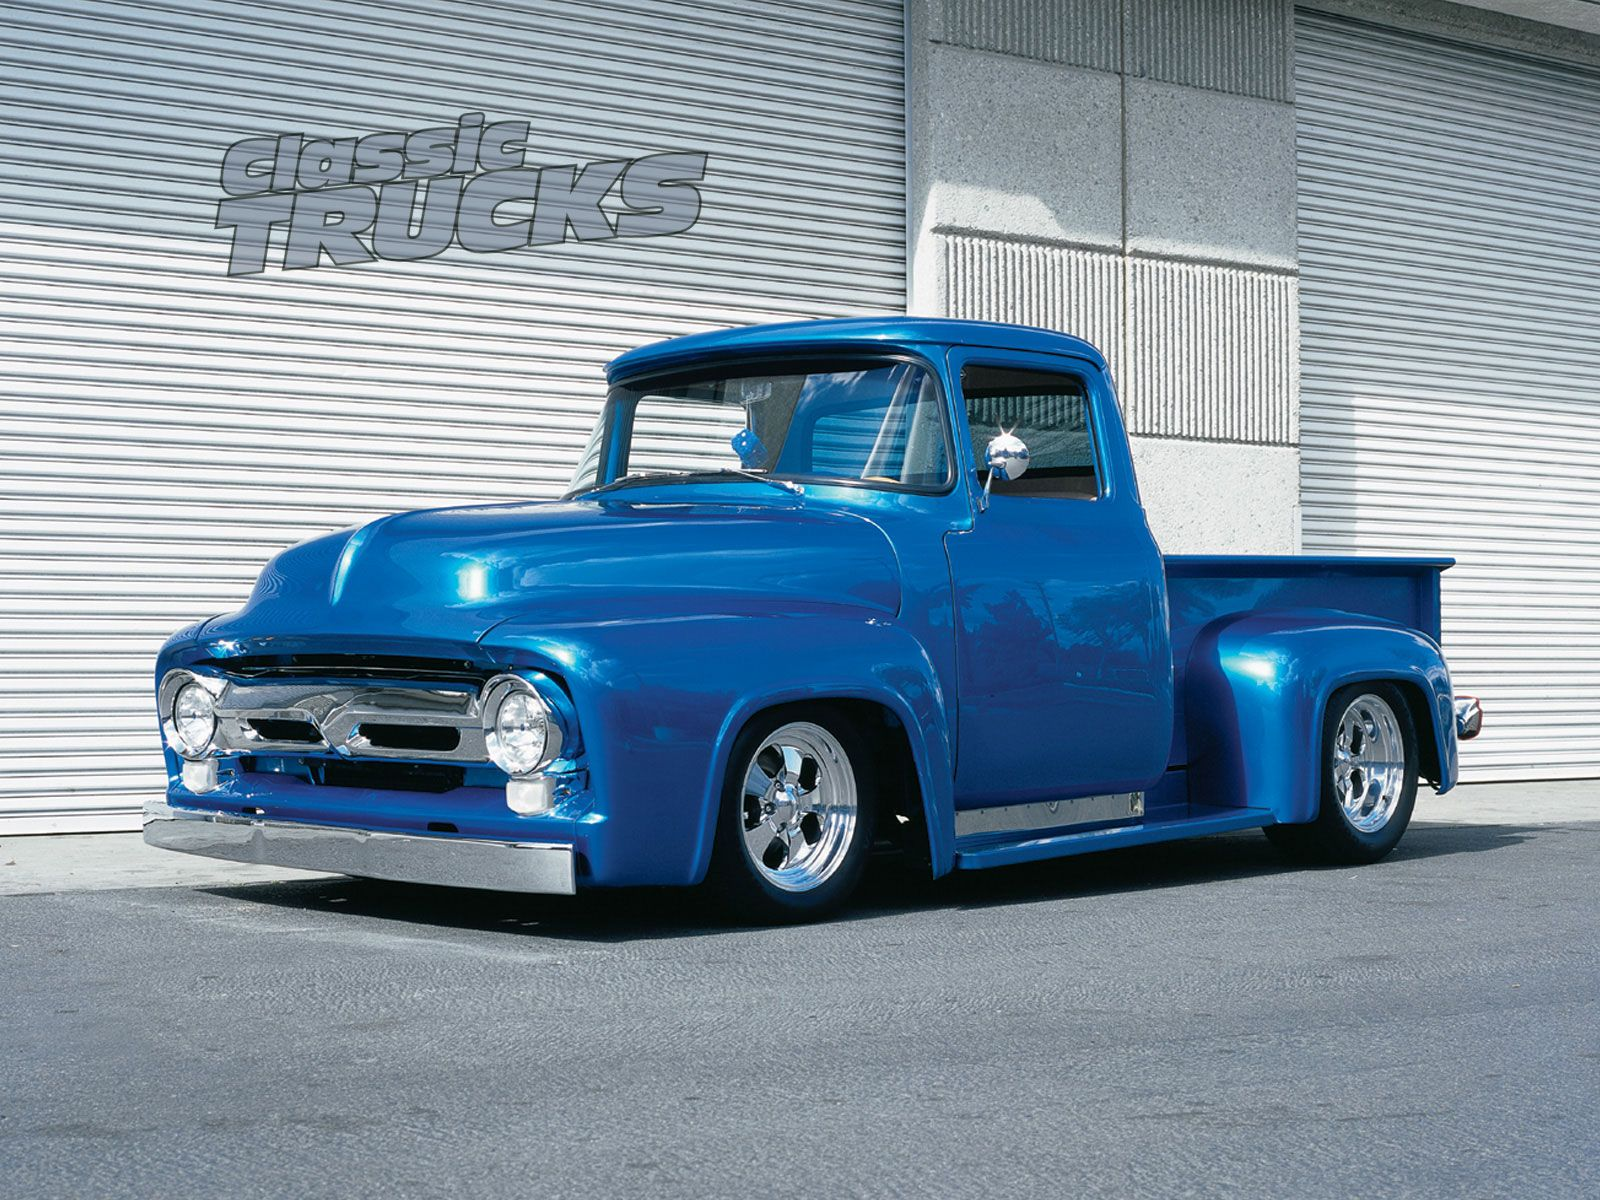 old ford trucks wallpaper wallpapersafari. Black Bedroom Furniture Sets. Home Design Ideas